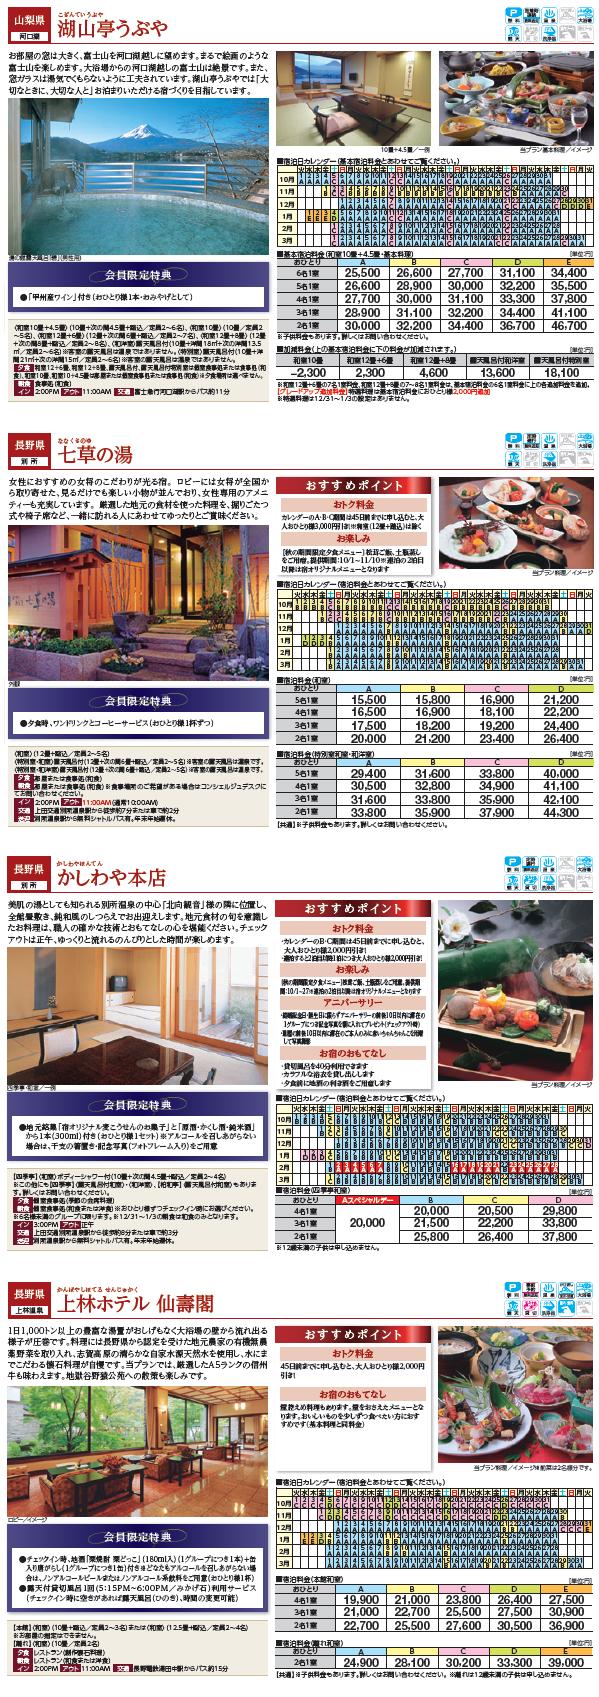 ryokan_plan1310_12